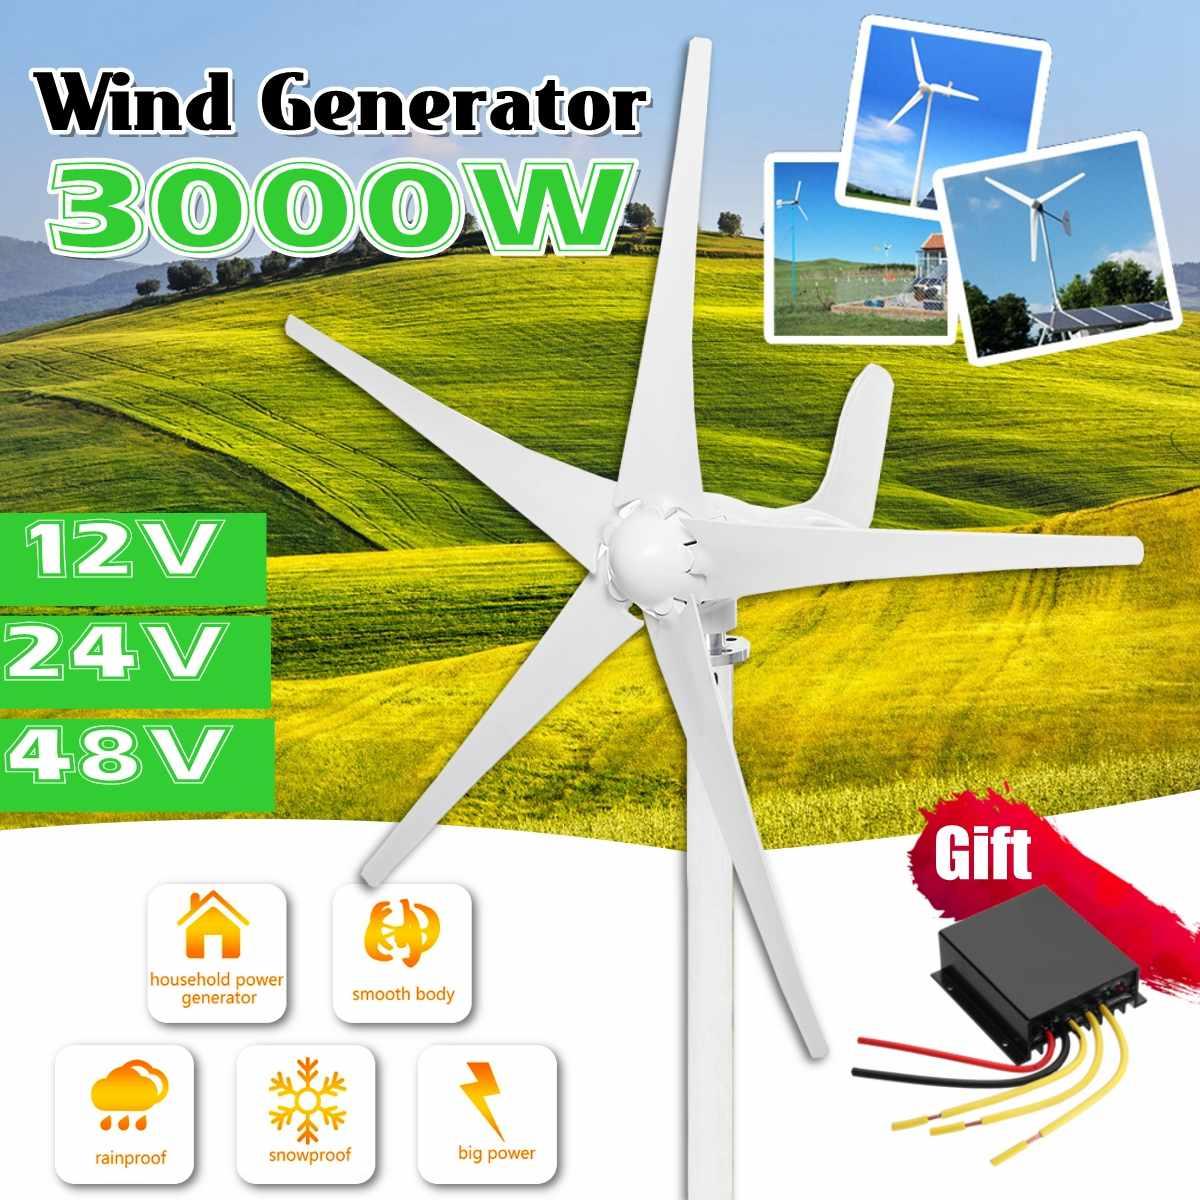 Turbina aerogeneradora de 5 aspas, 6000W, 12V/24V/48V, con controlador de viento libre, para uso en farolas solares domésticas, barco Adaptador para boquilla de espuma, Cañón de espuma, generador de espuma, jabón de alta presión para lavadora de presión Karcher K2 K3 K4 K5 K6 K7